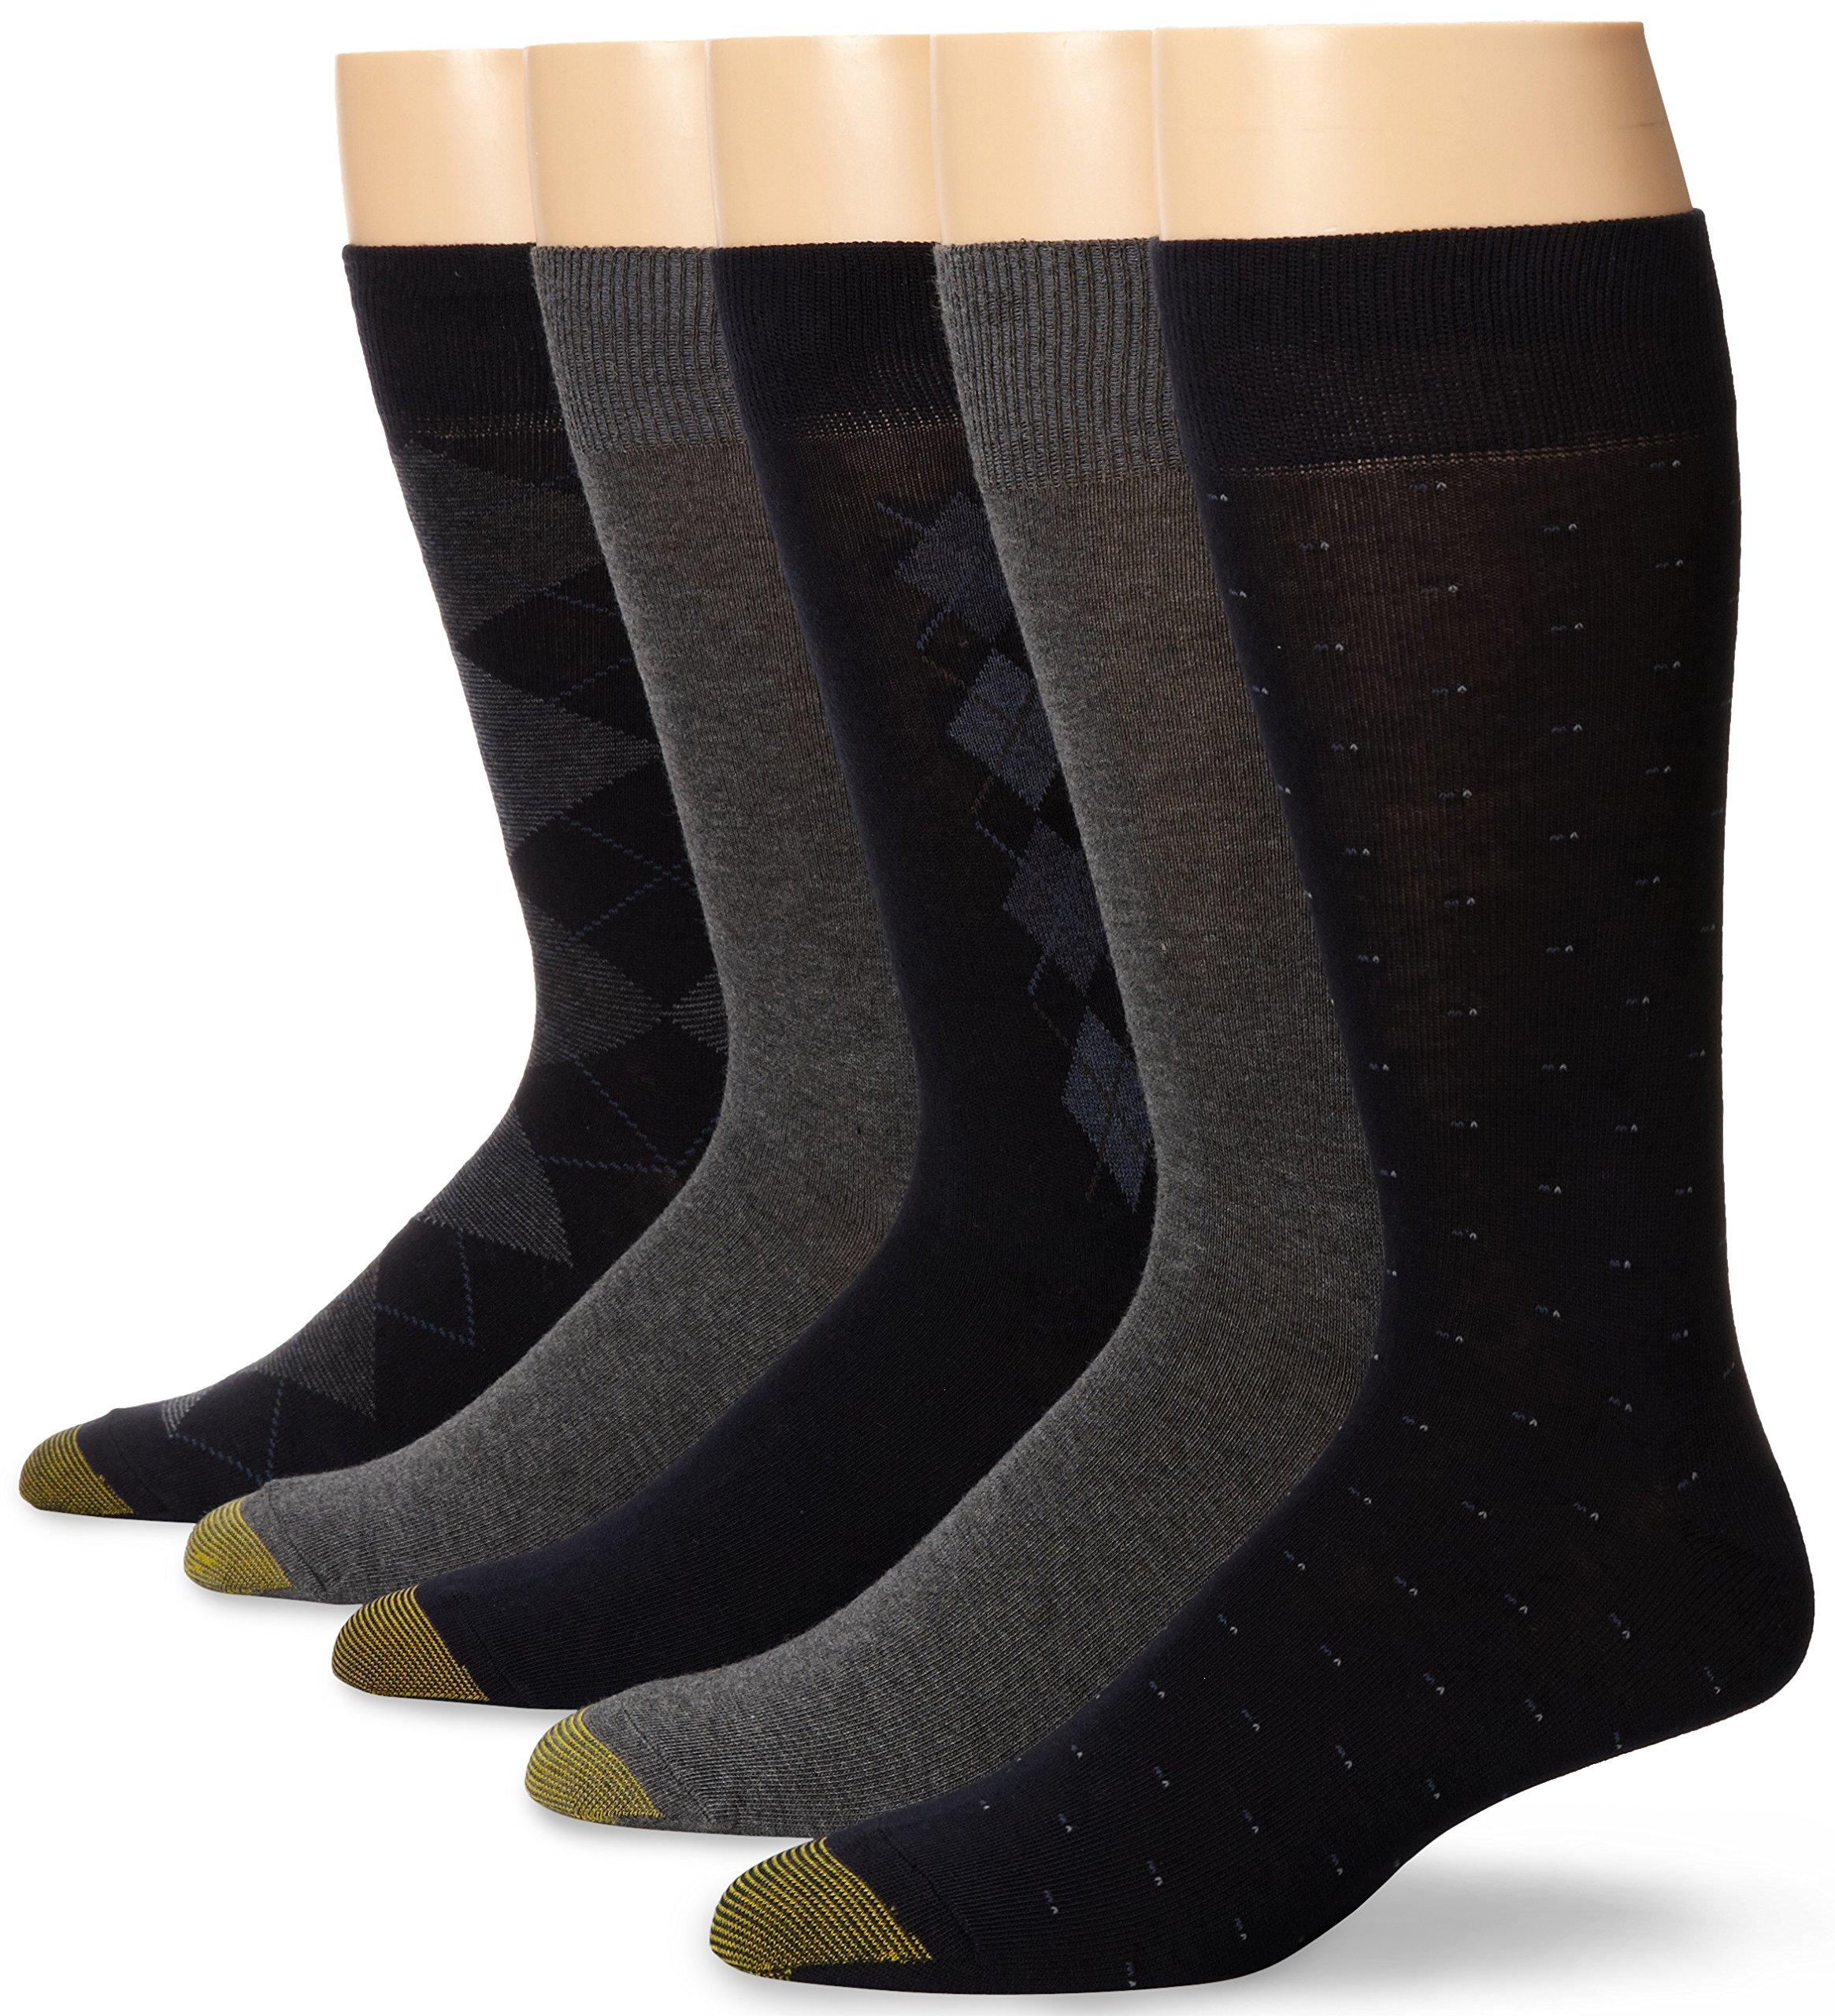 Gold Toe Men's Argyle Assorted Crew 5 Pack, Navy/Light Grey, Sock Size: 10-13/Shoe Size:9-11